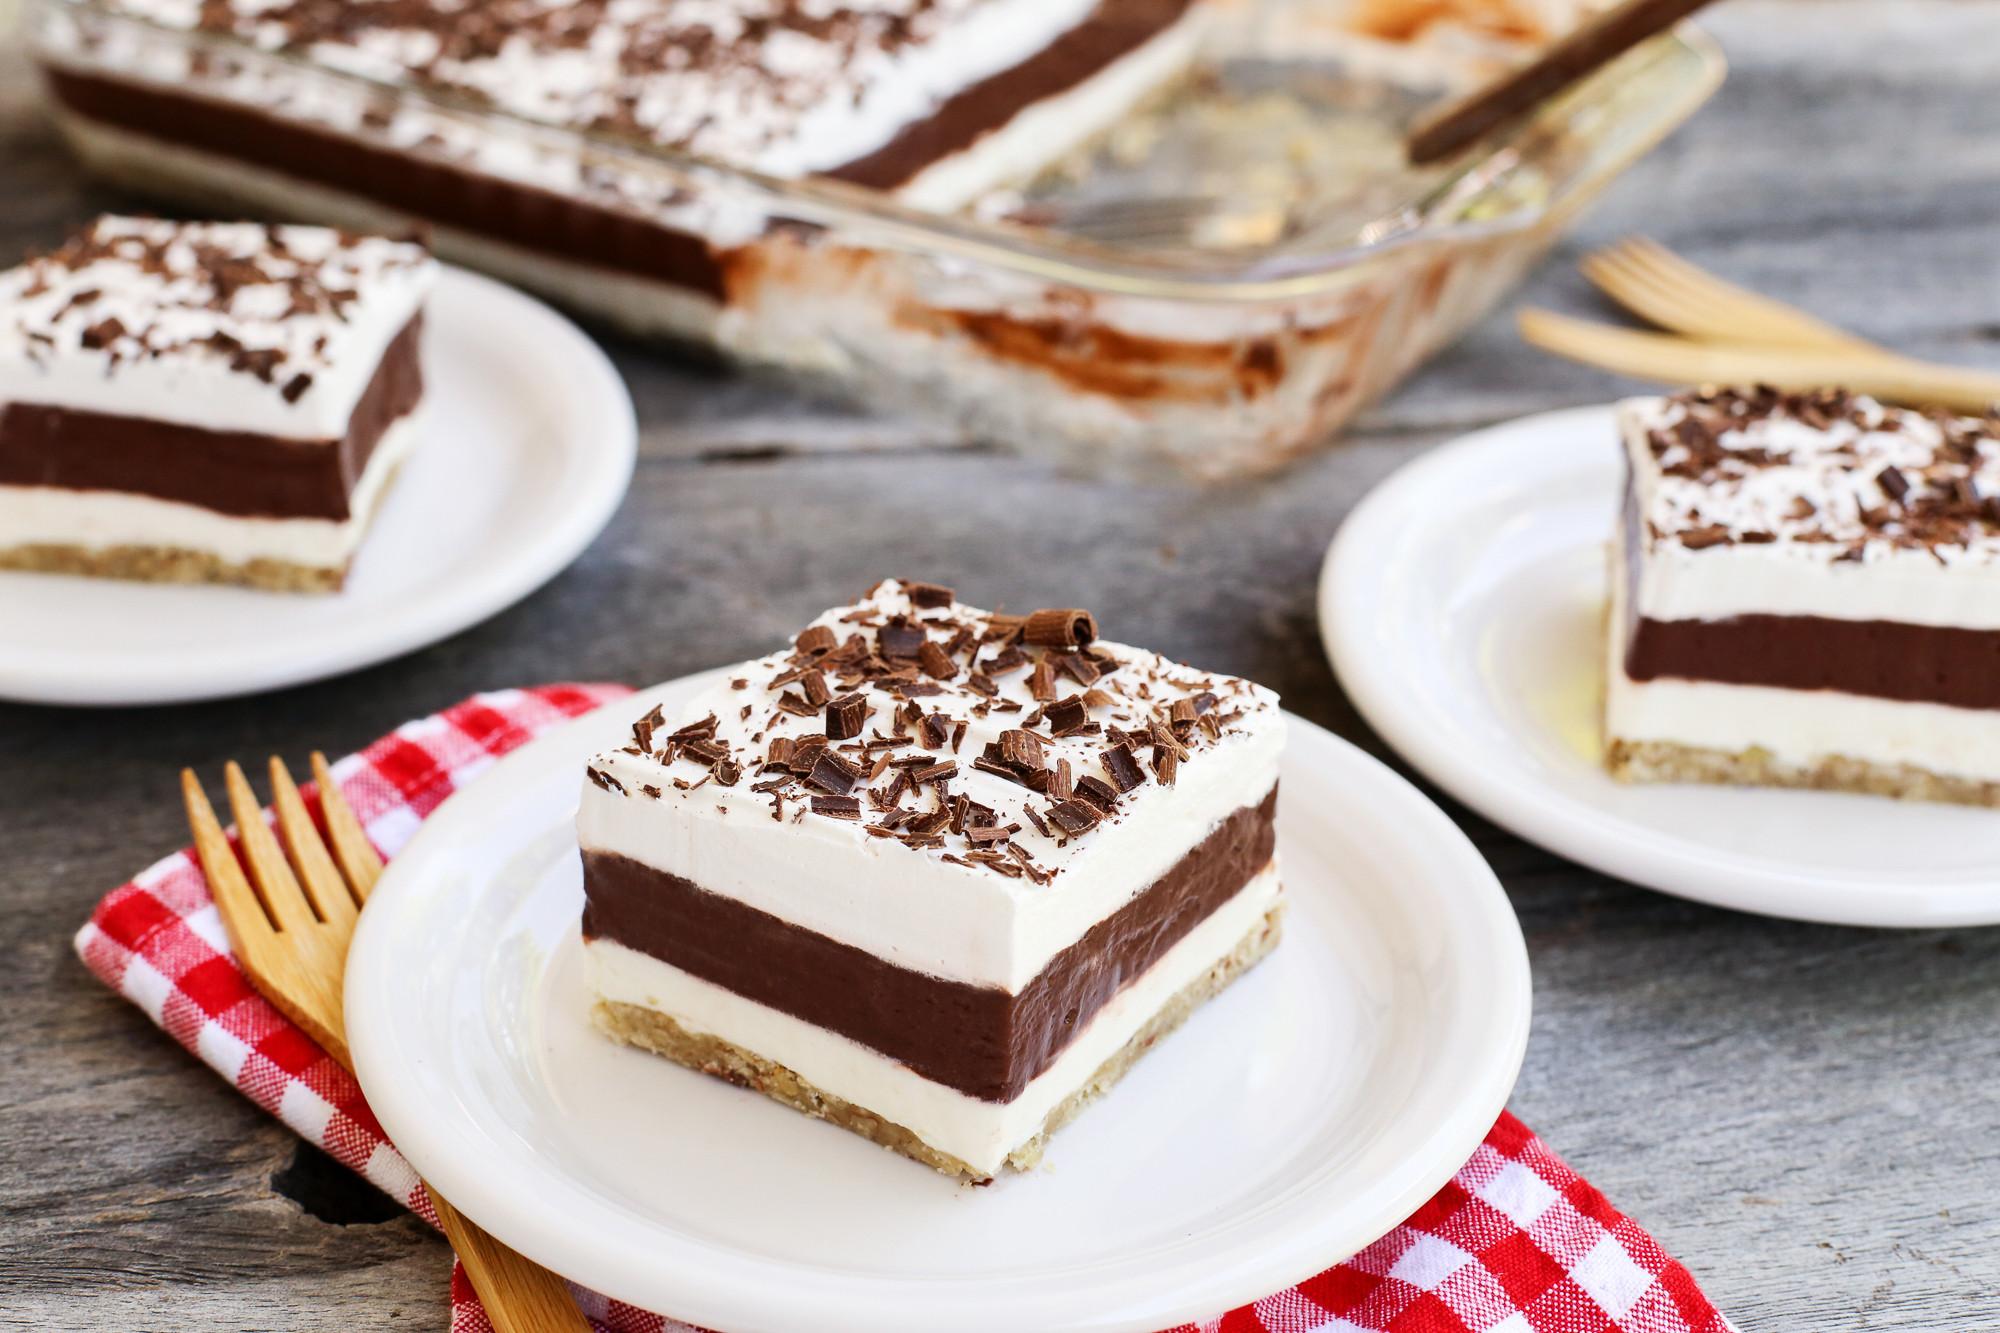 Chocolate Pudding Desserts  Layered Chocolate Pudding Dessert